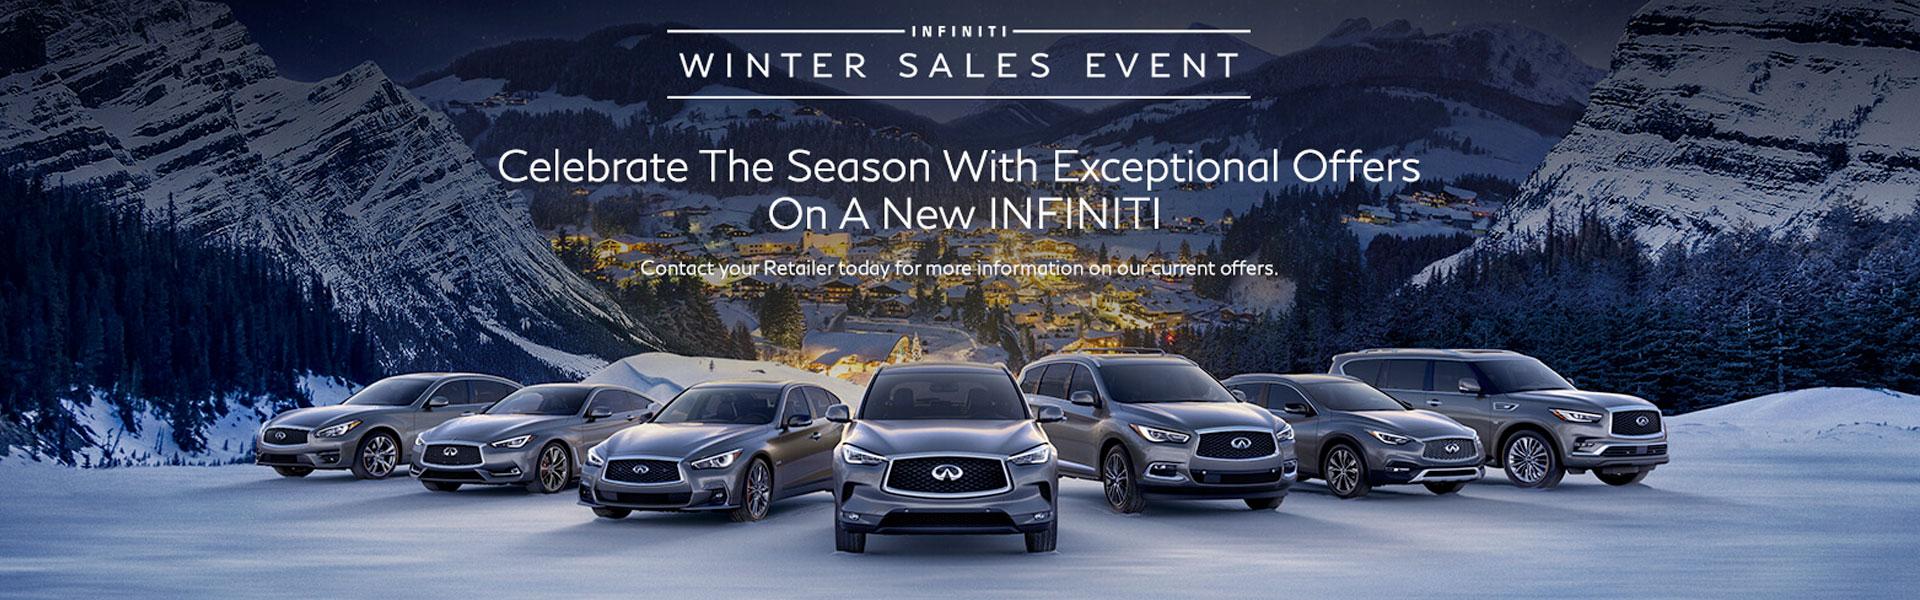 INFINITI WINTER EVENT